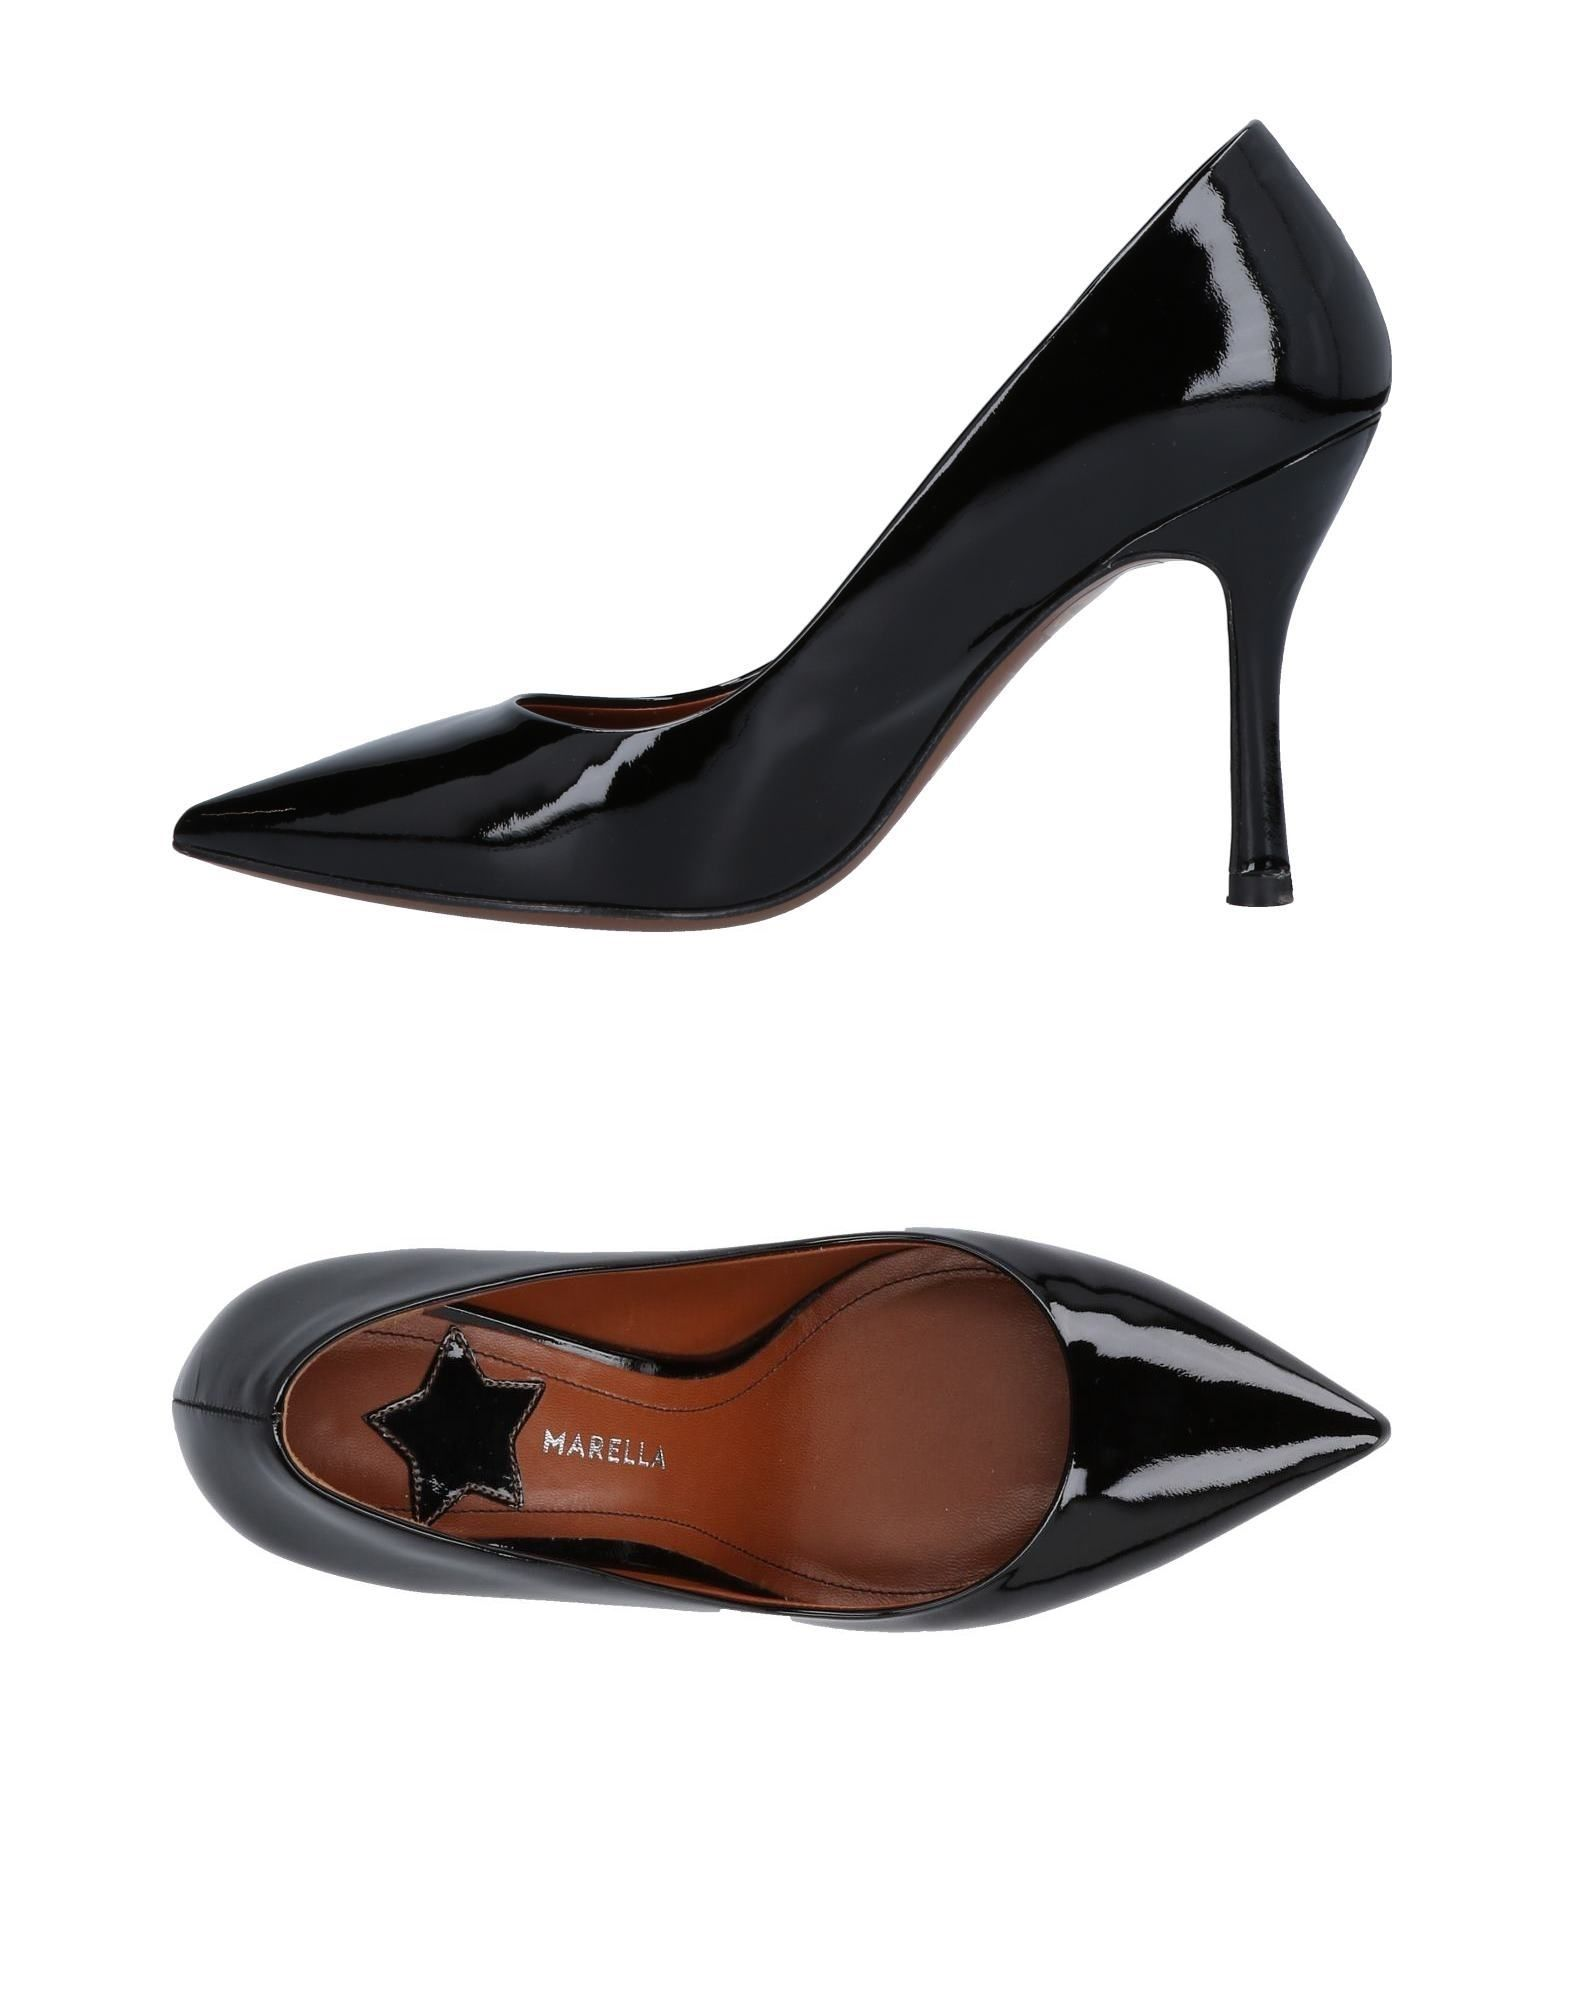 Marella Pumps Damen  11489544GK Schuhe Gute Qualität beliebte Schuhe 11489544GK d8af97